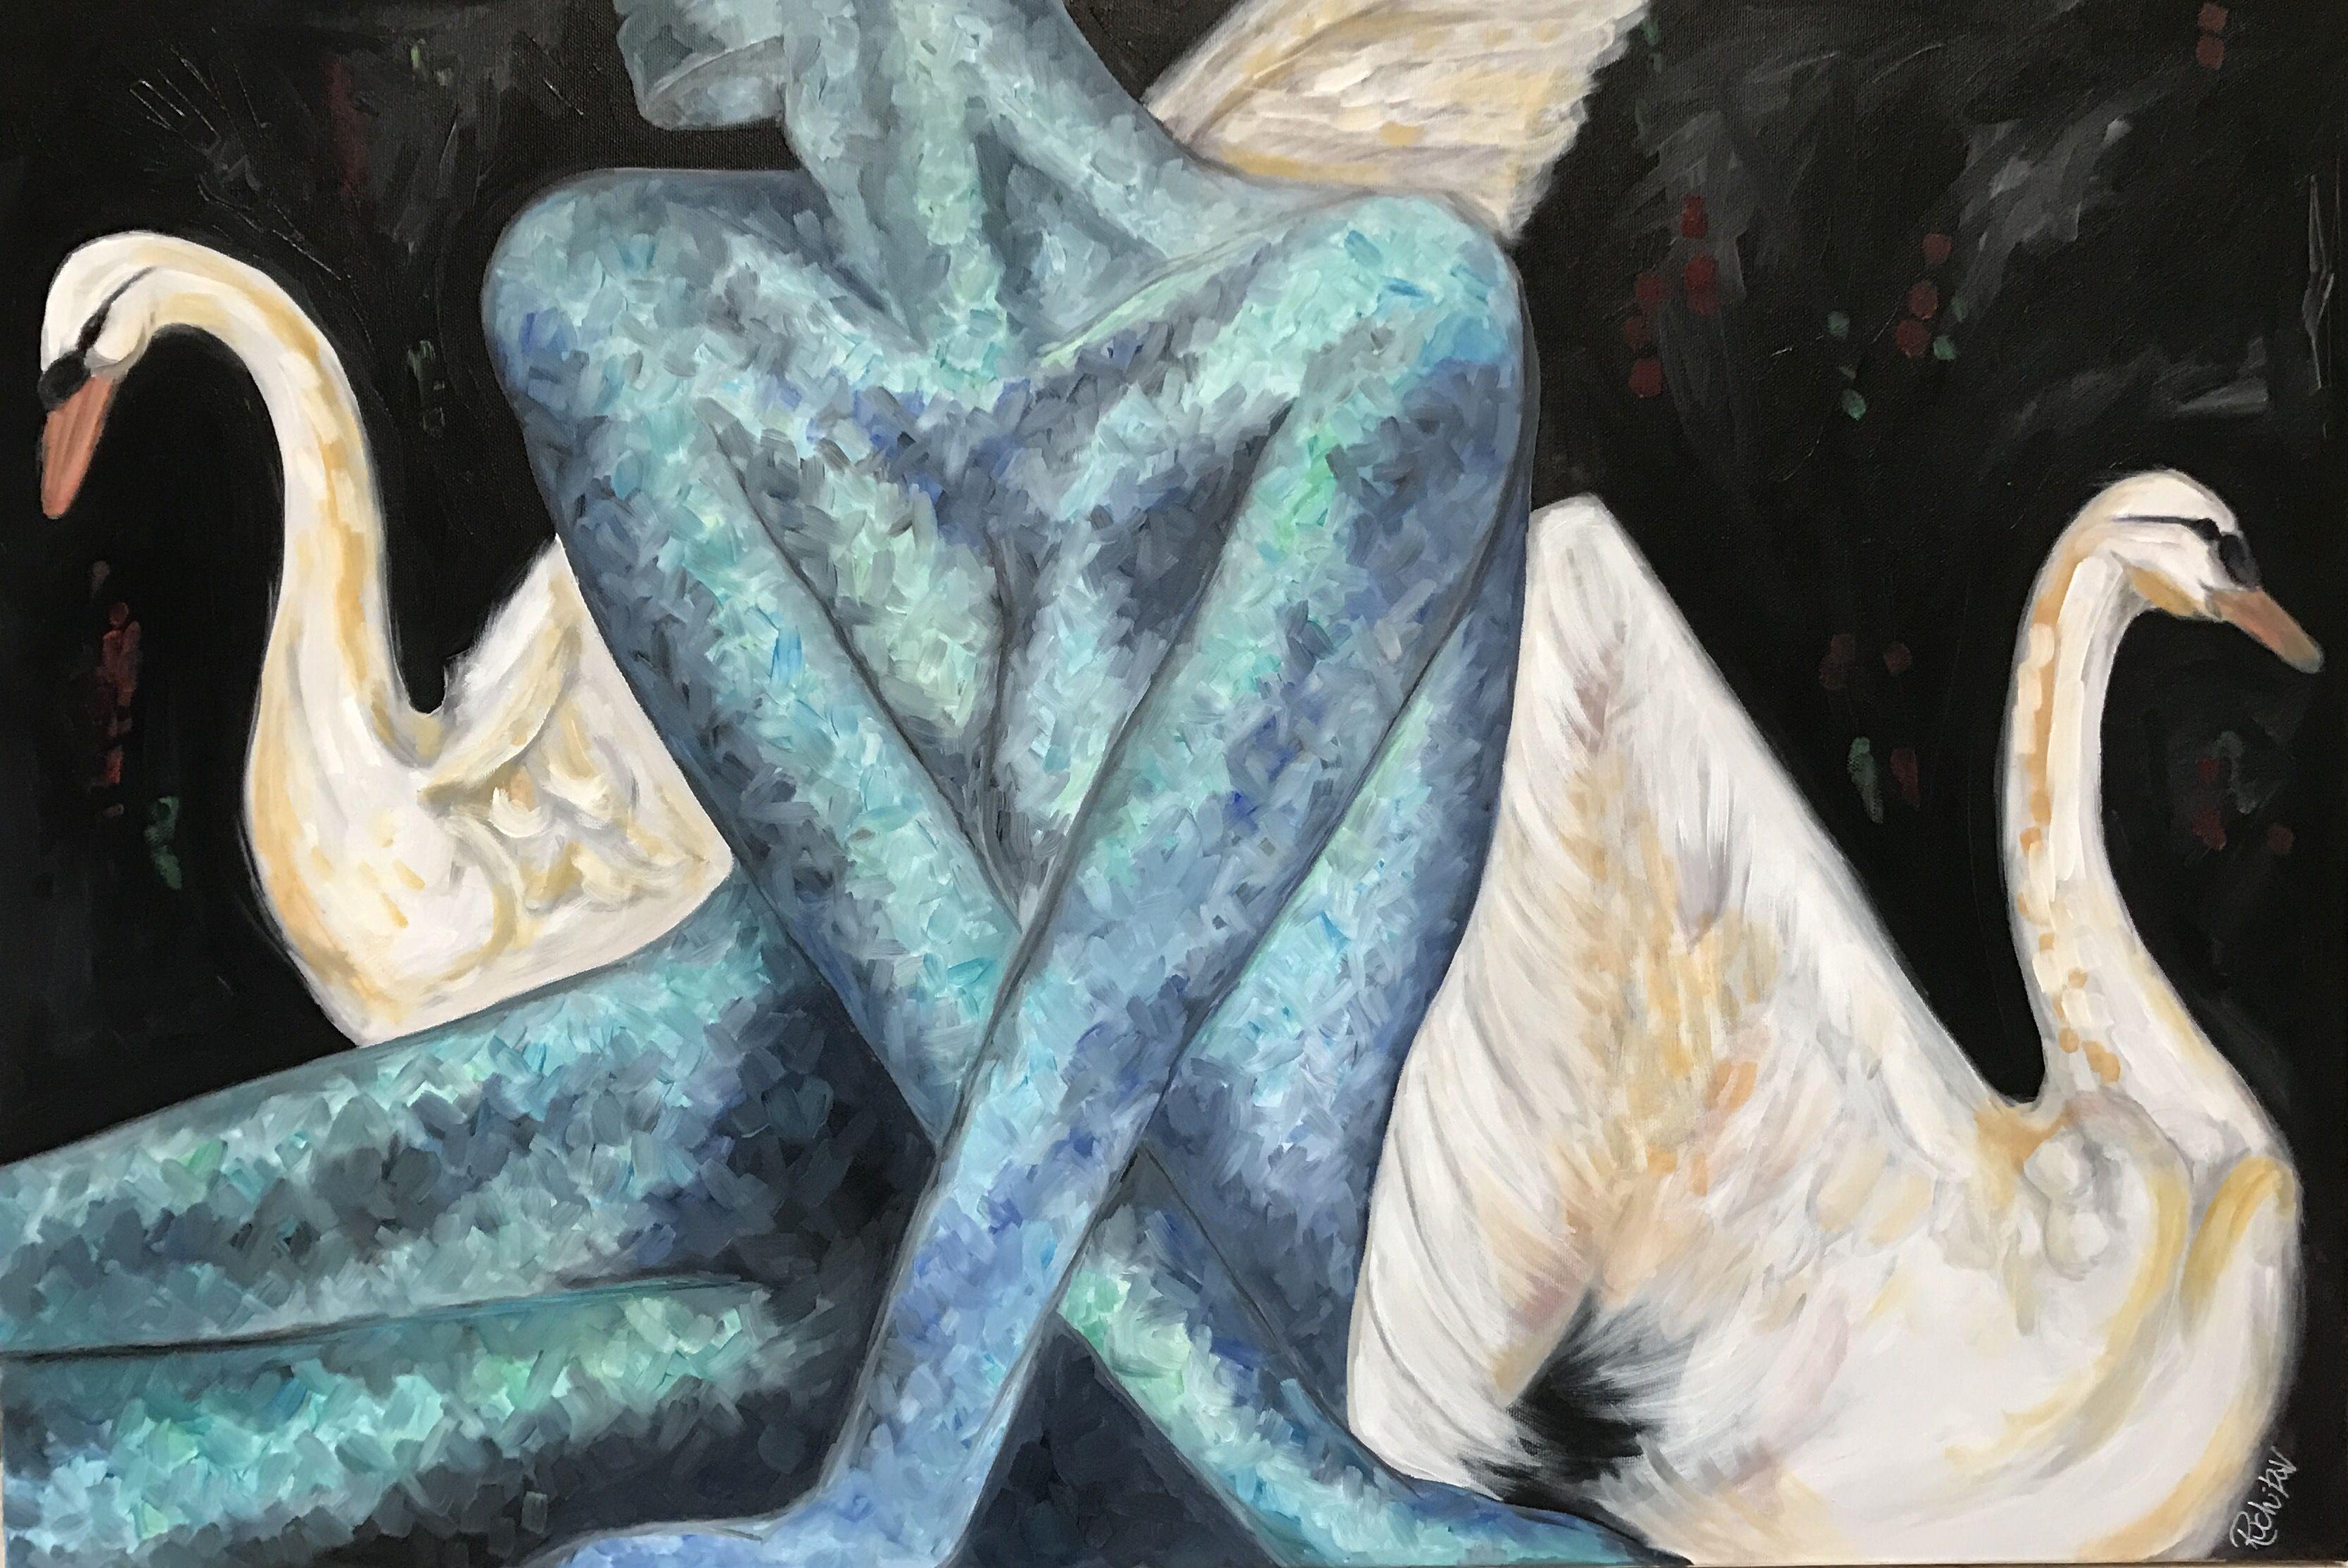 Ruchika Vaswani Art - Oil on Canvas  'Sweven' ; A Vision or a Dream.